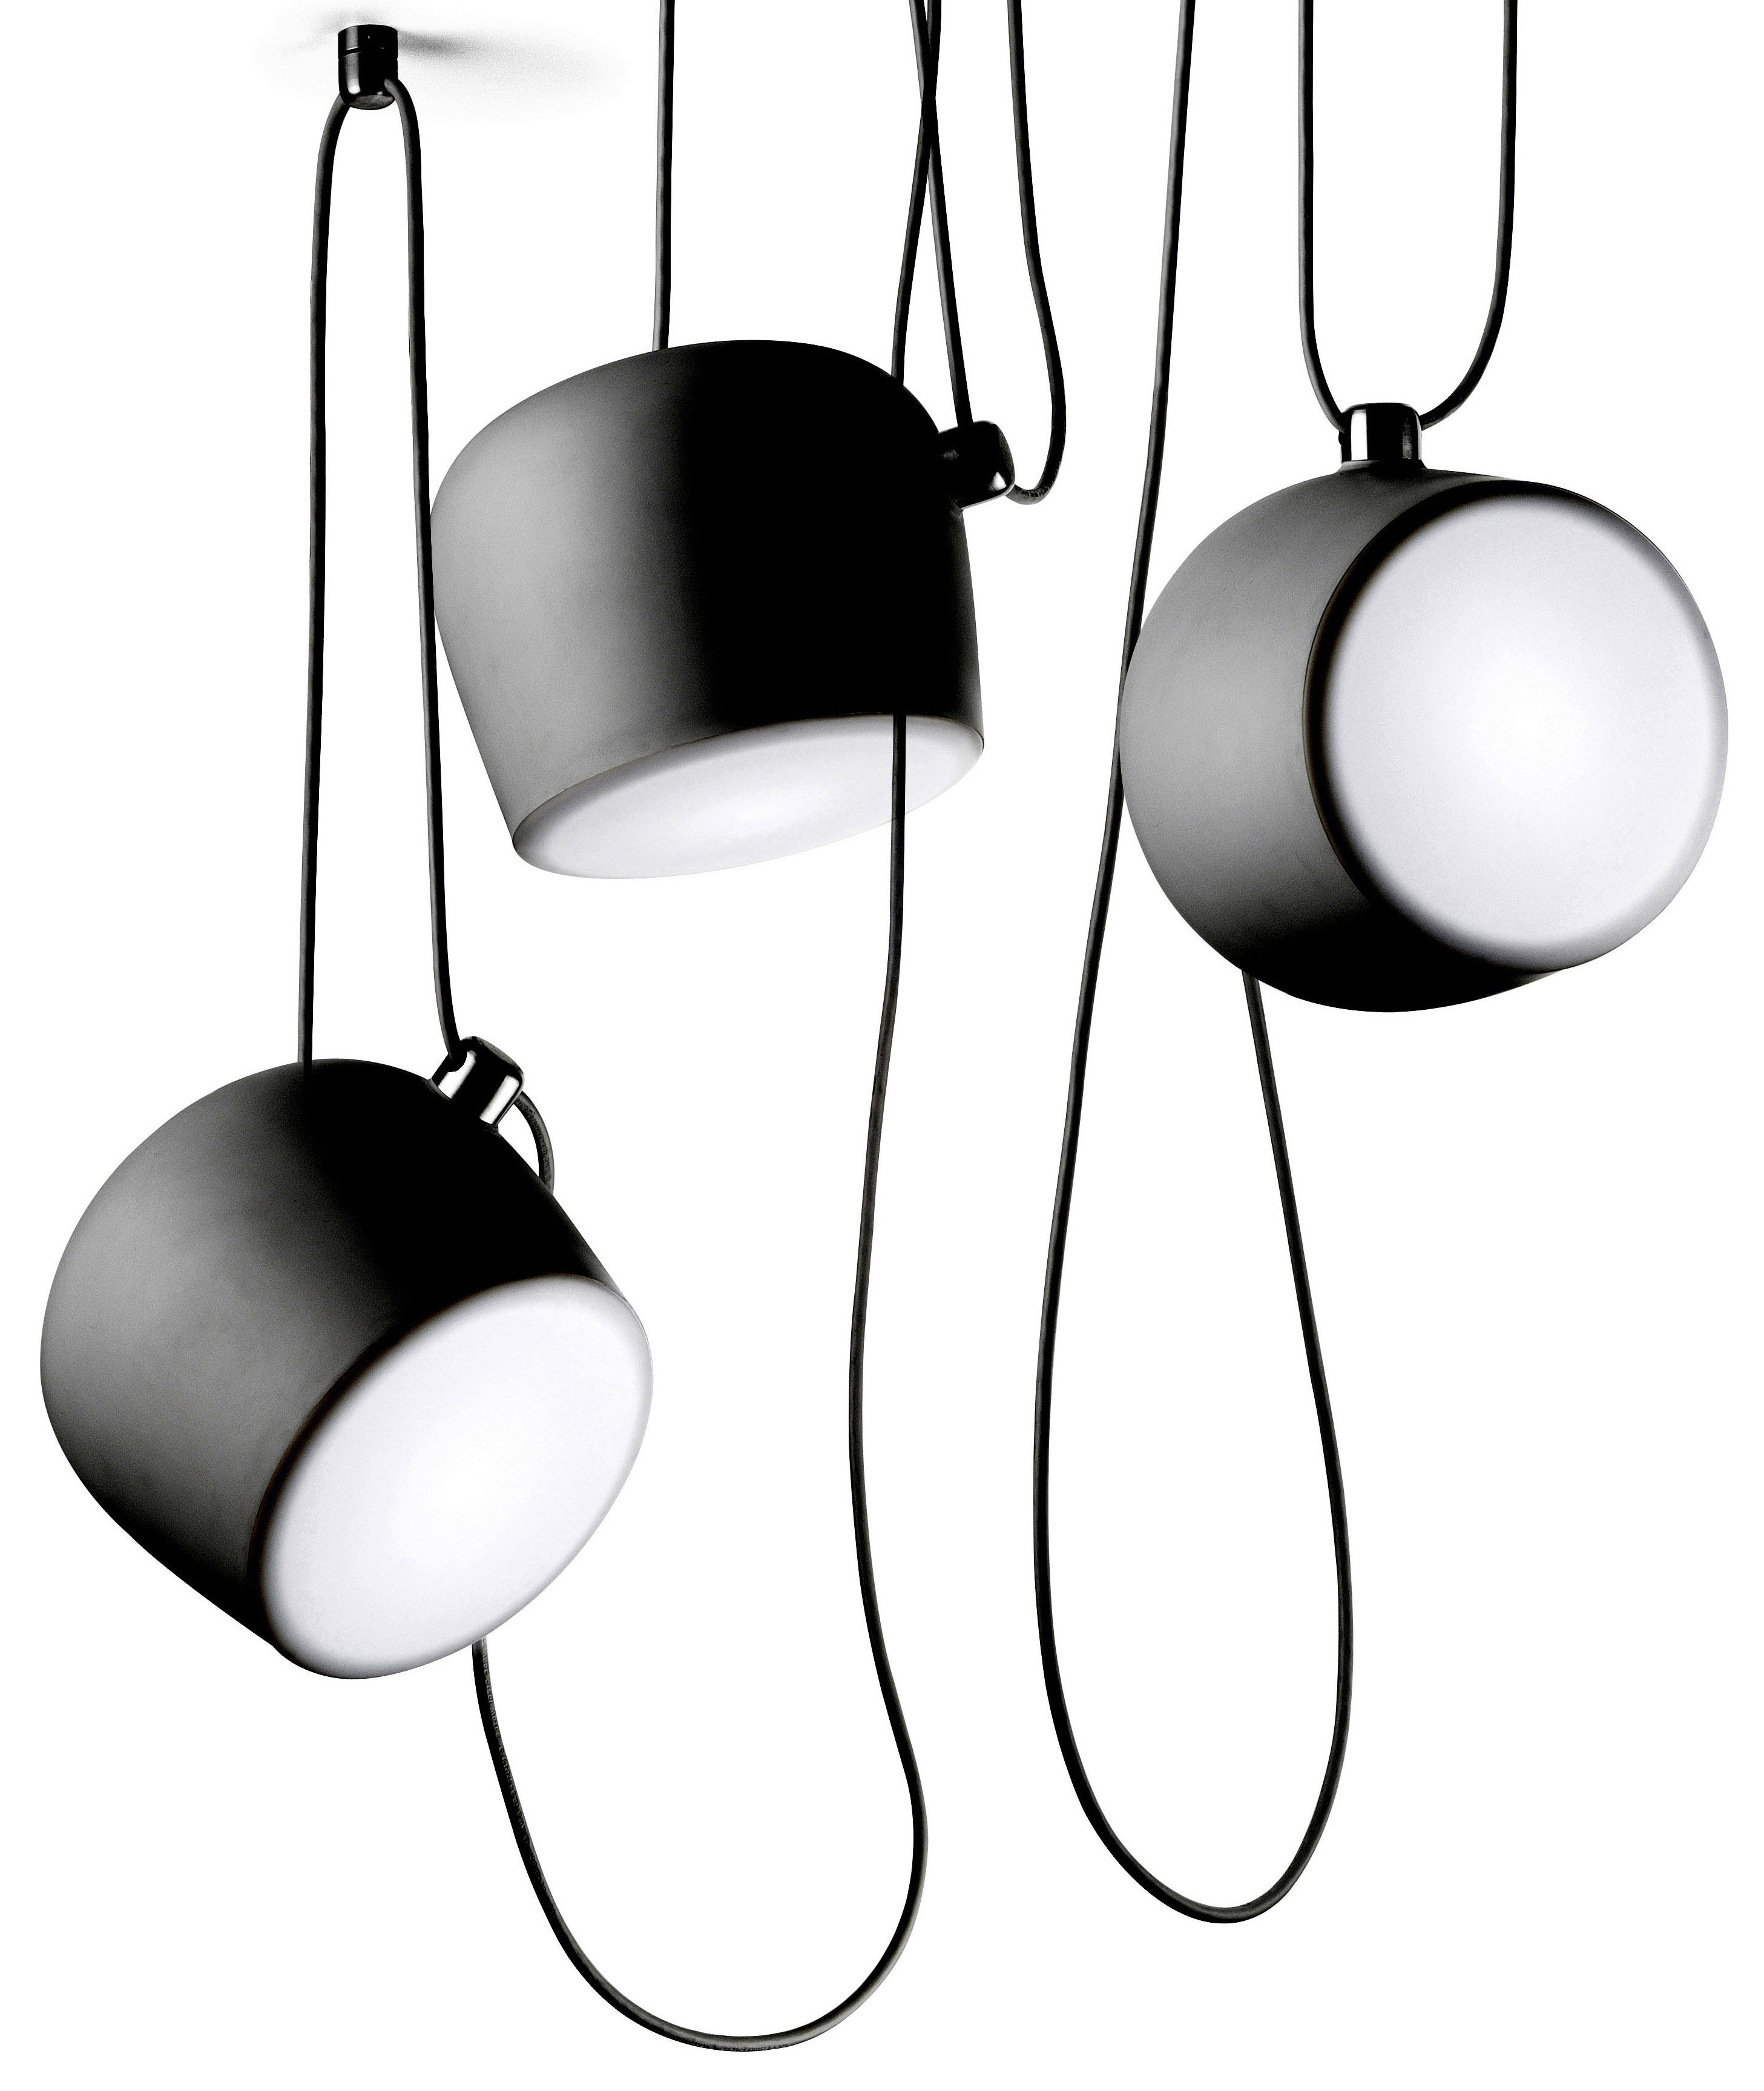 scopri sospensione aim led sospensione nera di flos made in design italia. Black Bedroom Furniture Sets. Home Design Ideas